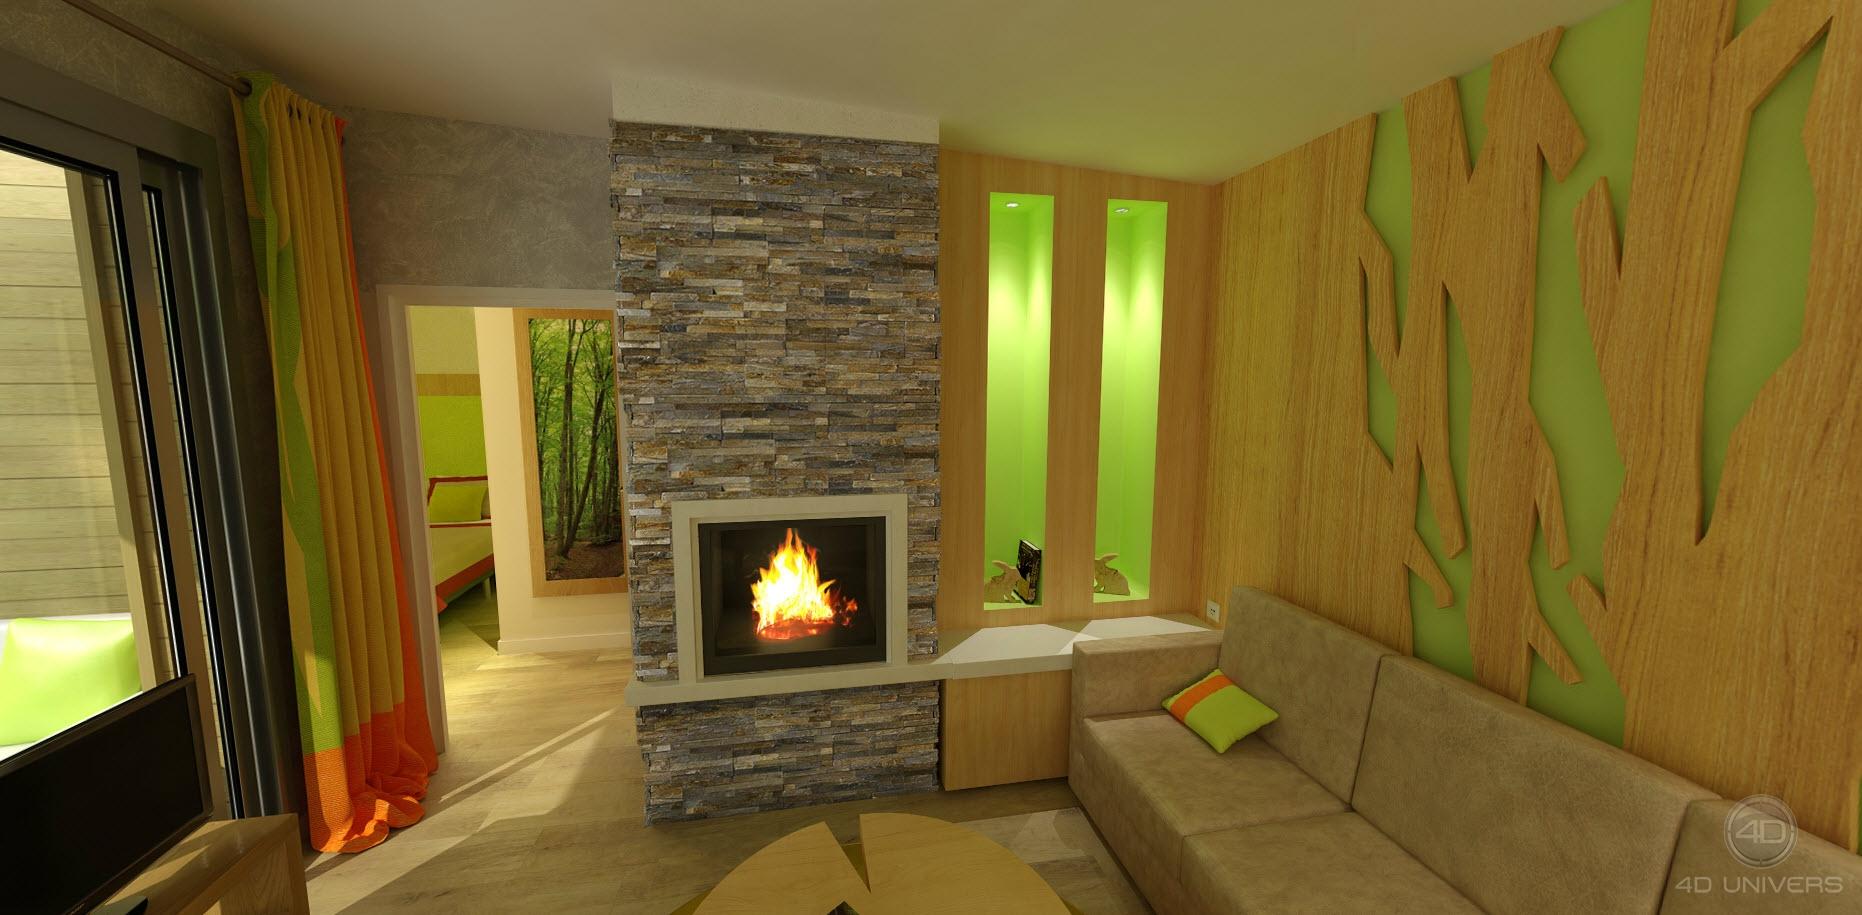 r alisation d une visite virtuelle 3d et perspectives 3d. Black Bedroom Furniture Sets. Home Design Ideas